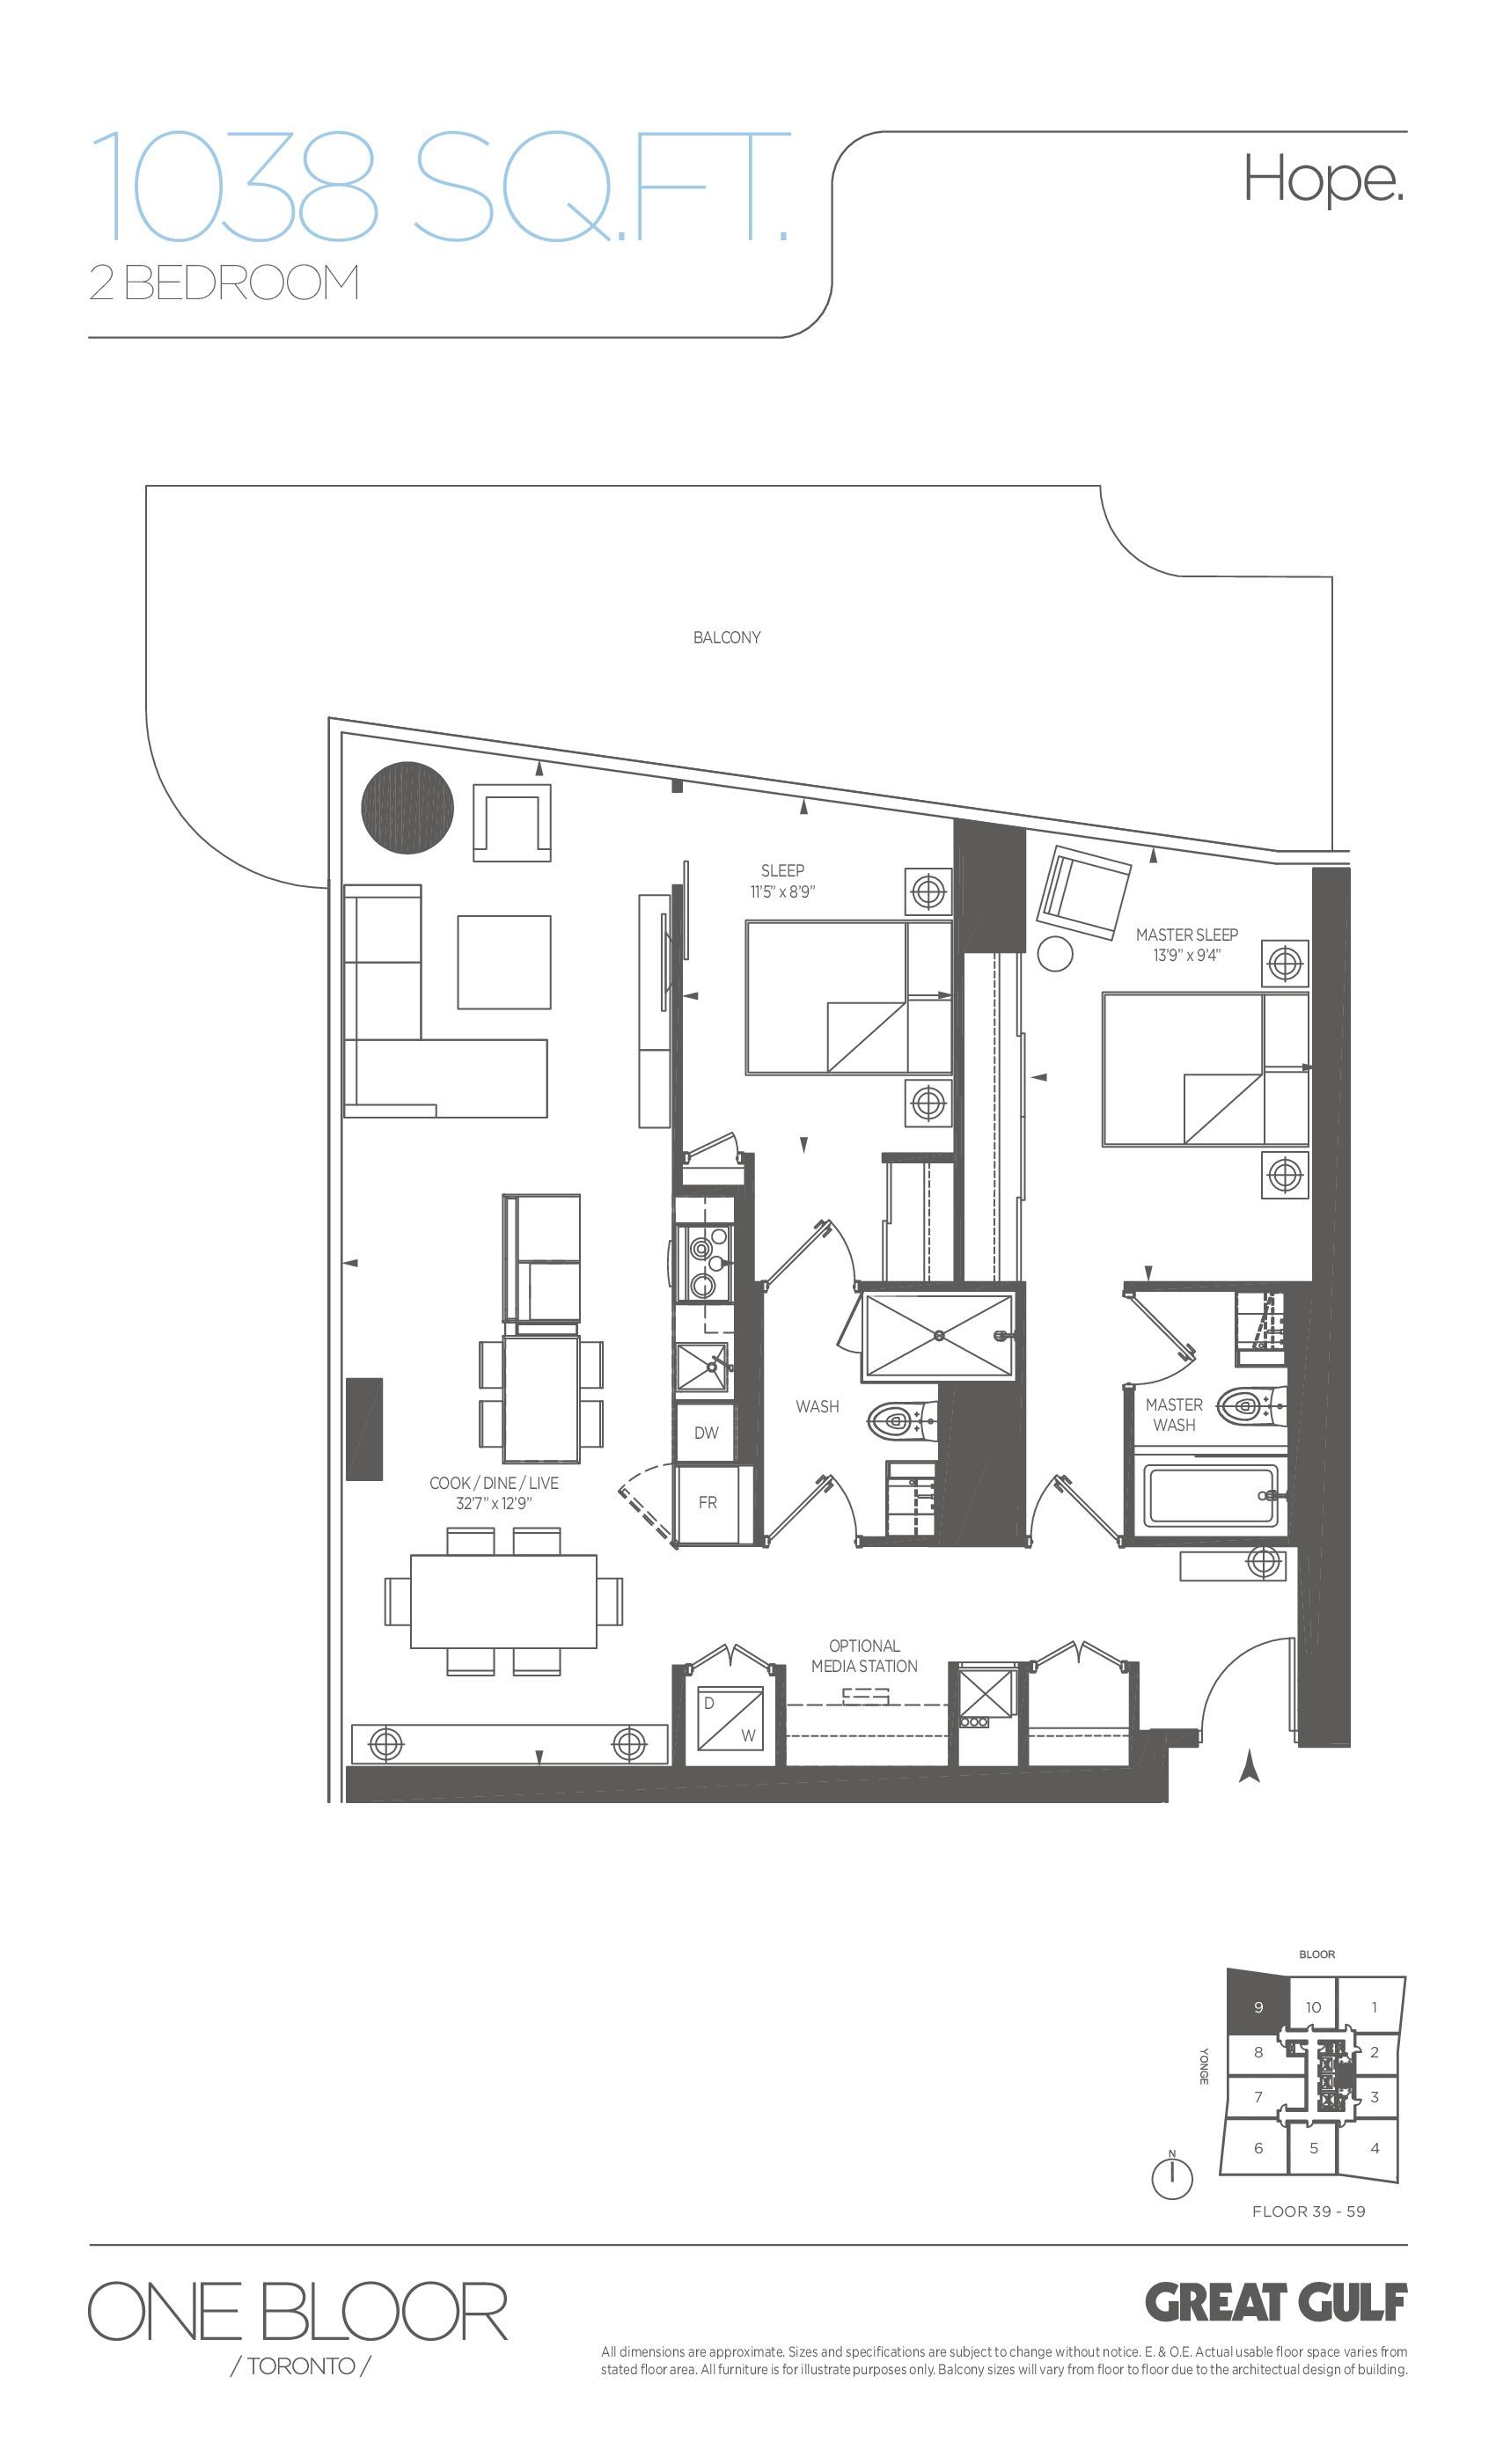 Hope Floor Plan at One Bloor Condos - 1038 sq.ft